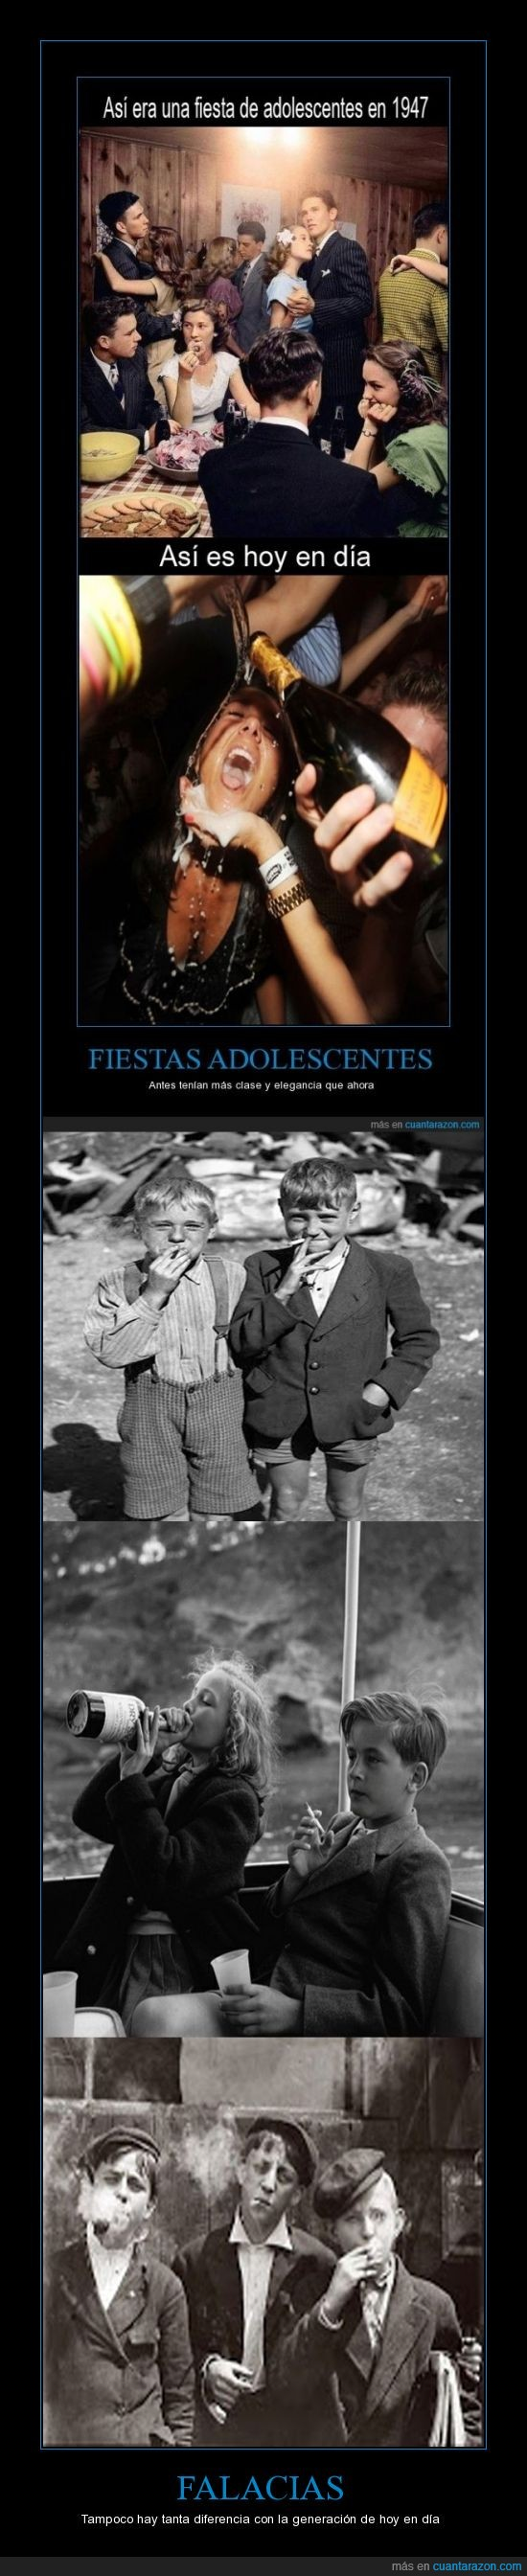 alcohol,antes era igual o peor,beber,falacia,fumando,juventud,niños